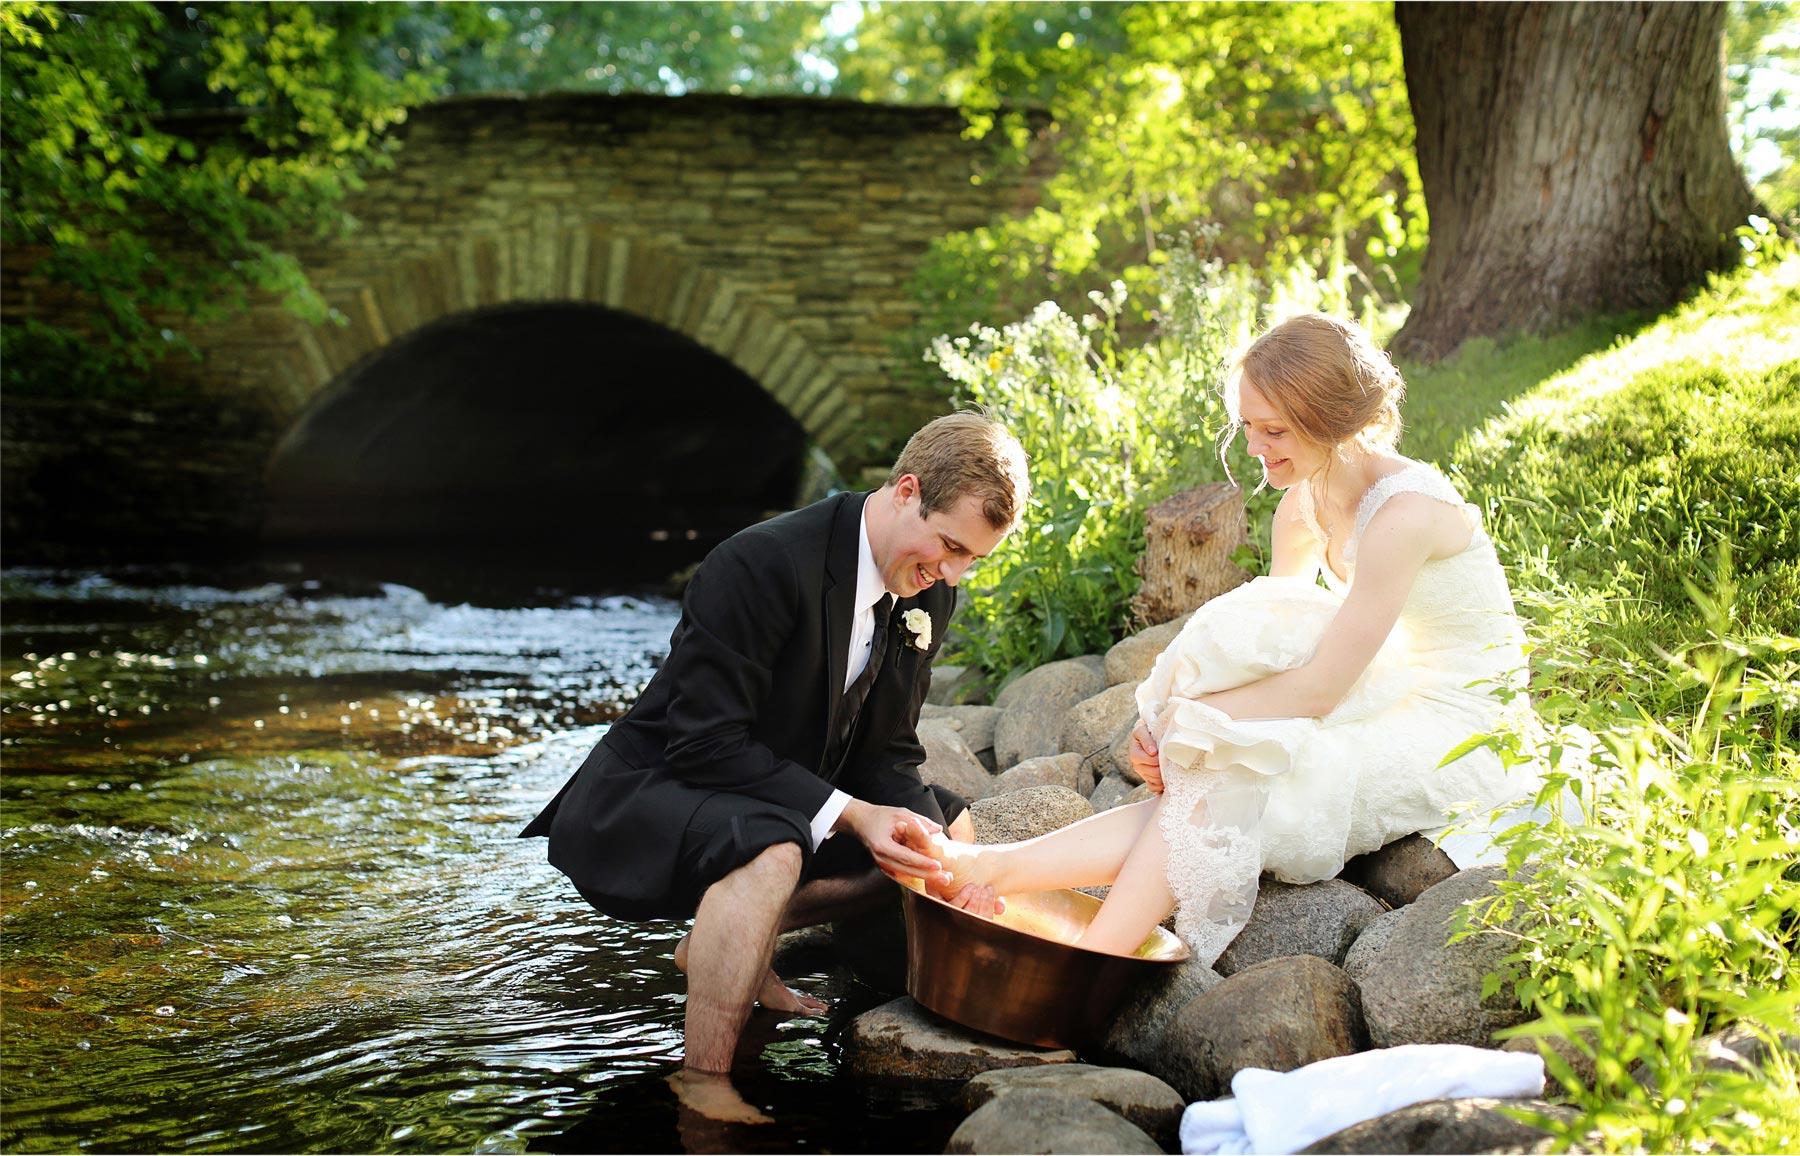 22-Edina-Minnesota-Wedding-Photographer-by-Andrew-Vick-Photography-Summer-Bride-Groom-Ceremonial-Foot-Washing-Creek-Betsy-and-Jon.jpg